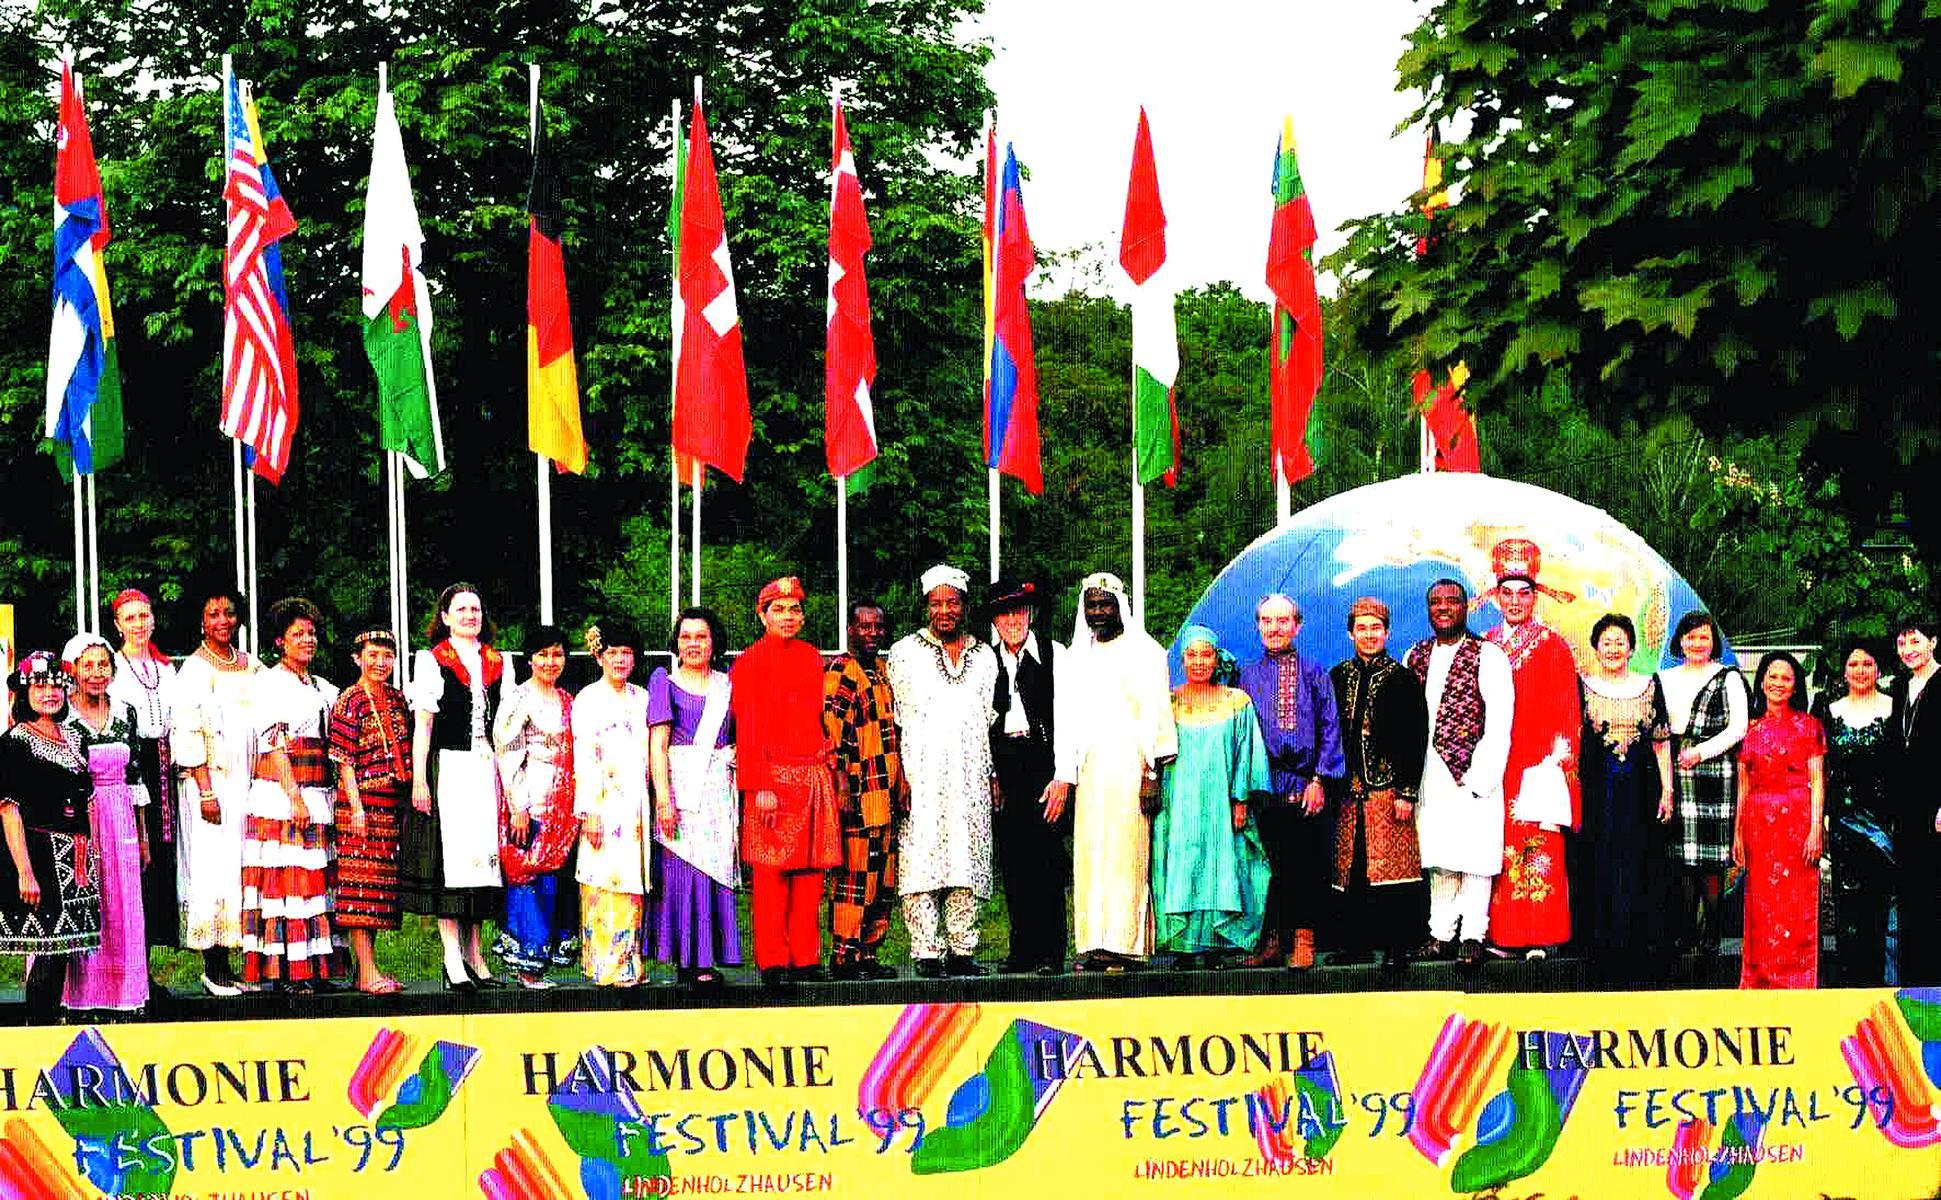 Harmonie Festival 1999